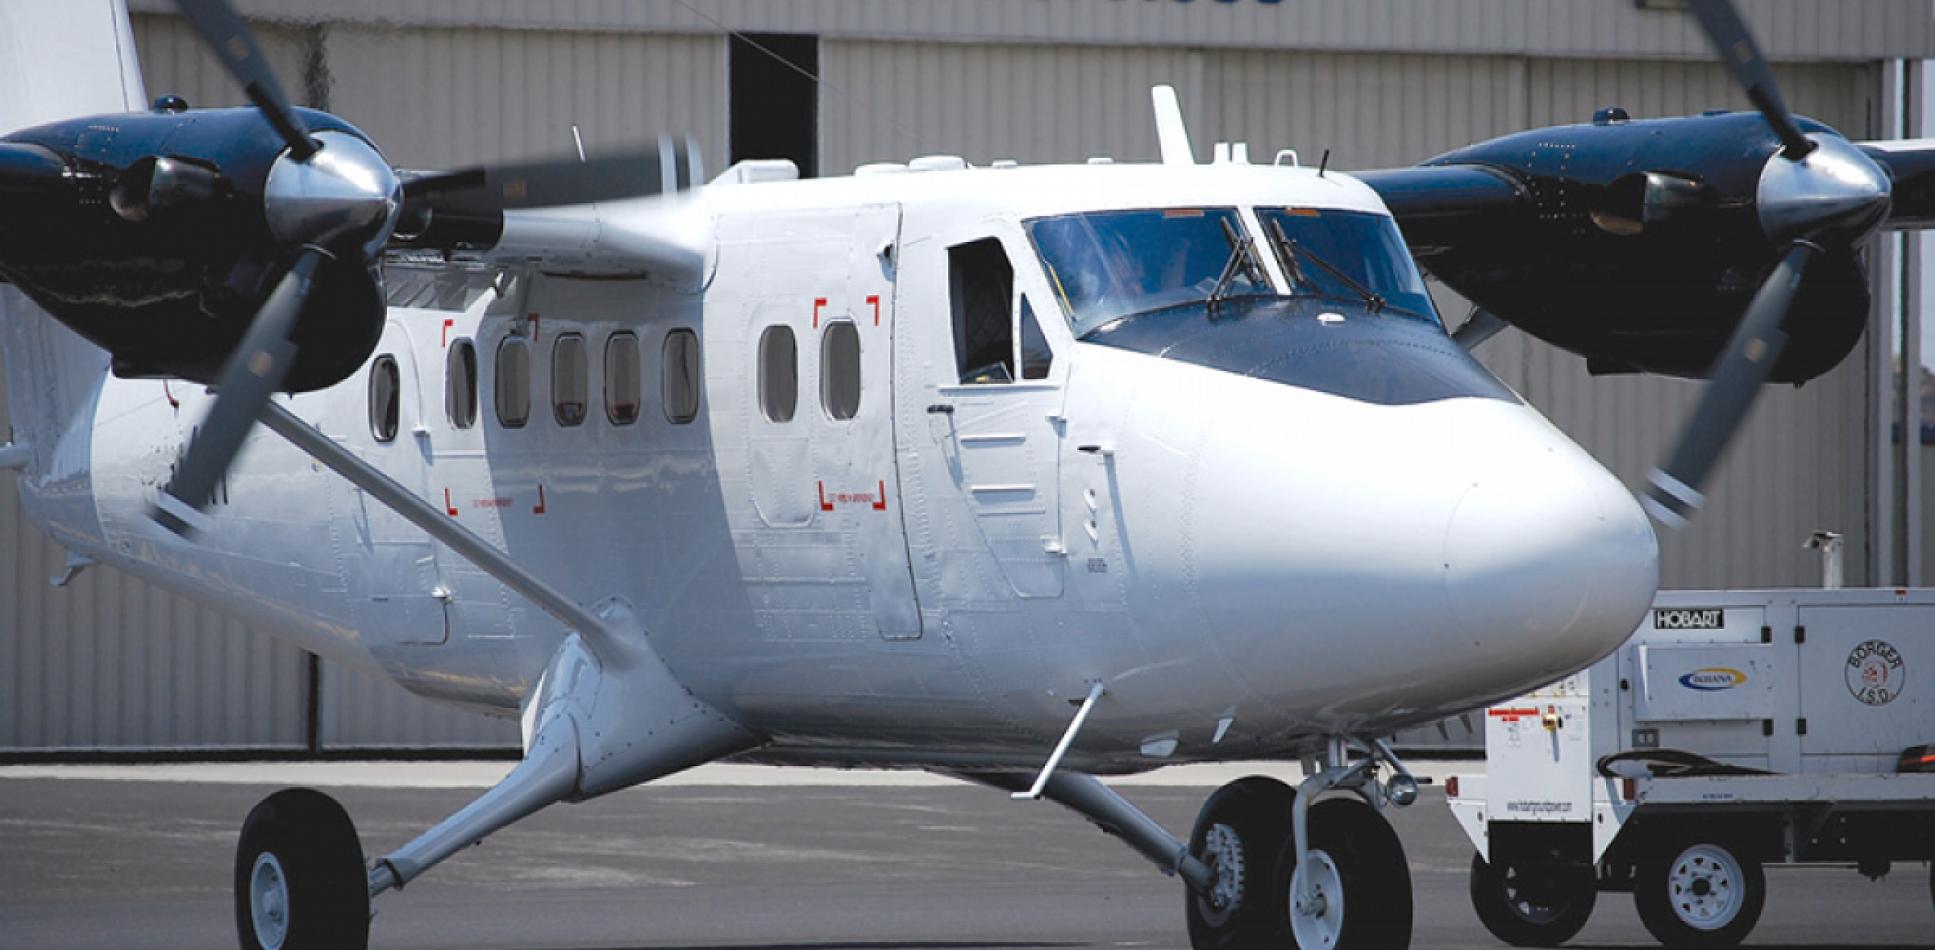 La Fuerza Aérea utilizará aviones Twin Otter.